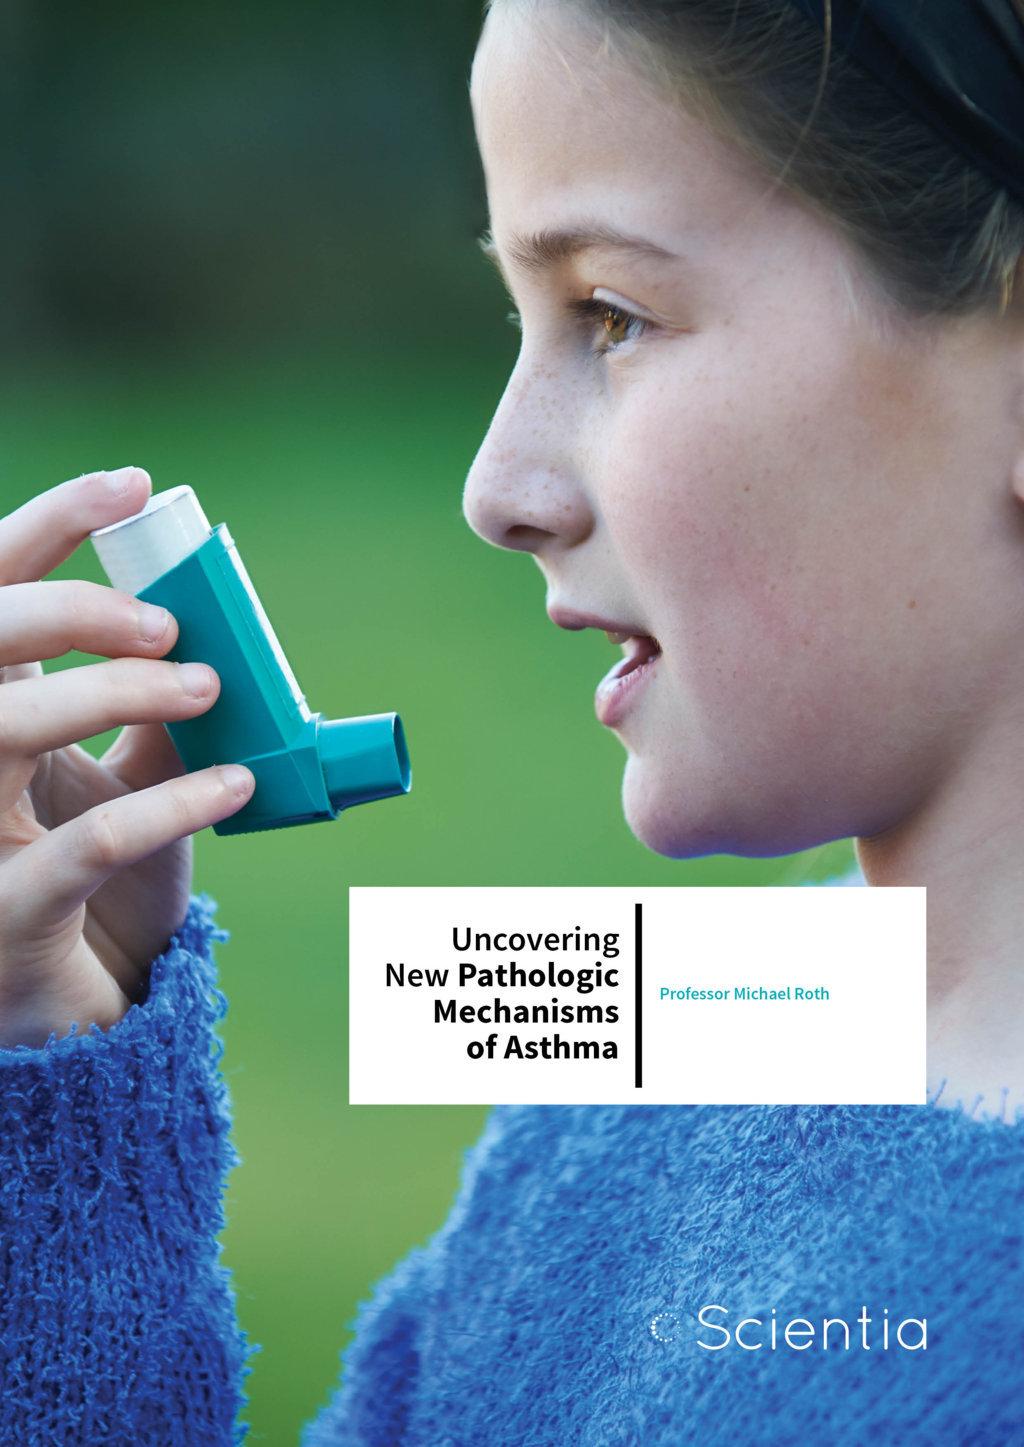 Professor Michael Roth – Uncovering New Pathologic Mechanisms of Asthma